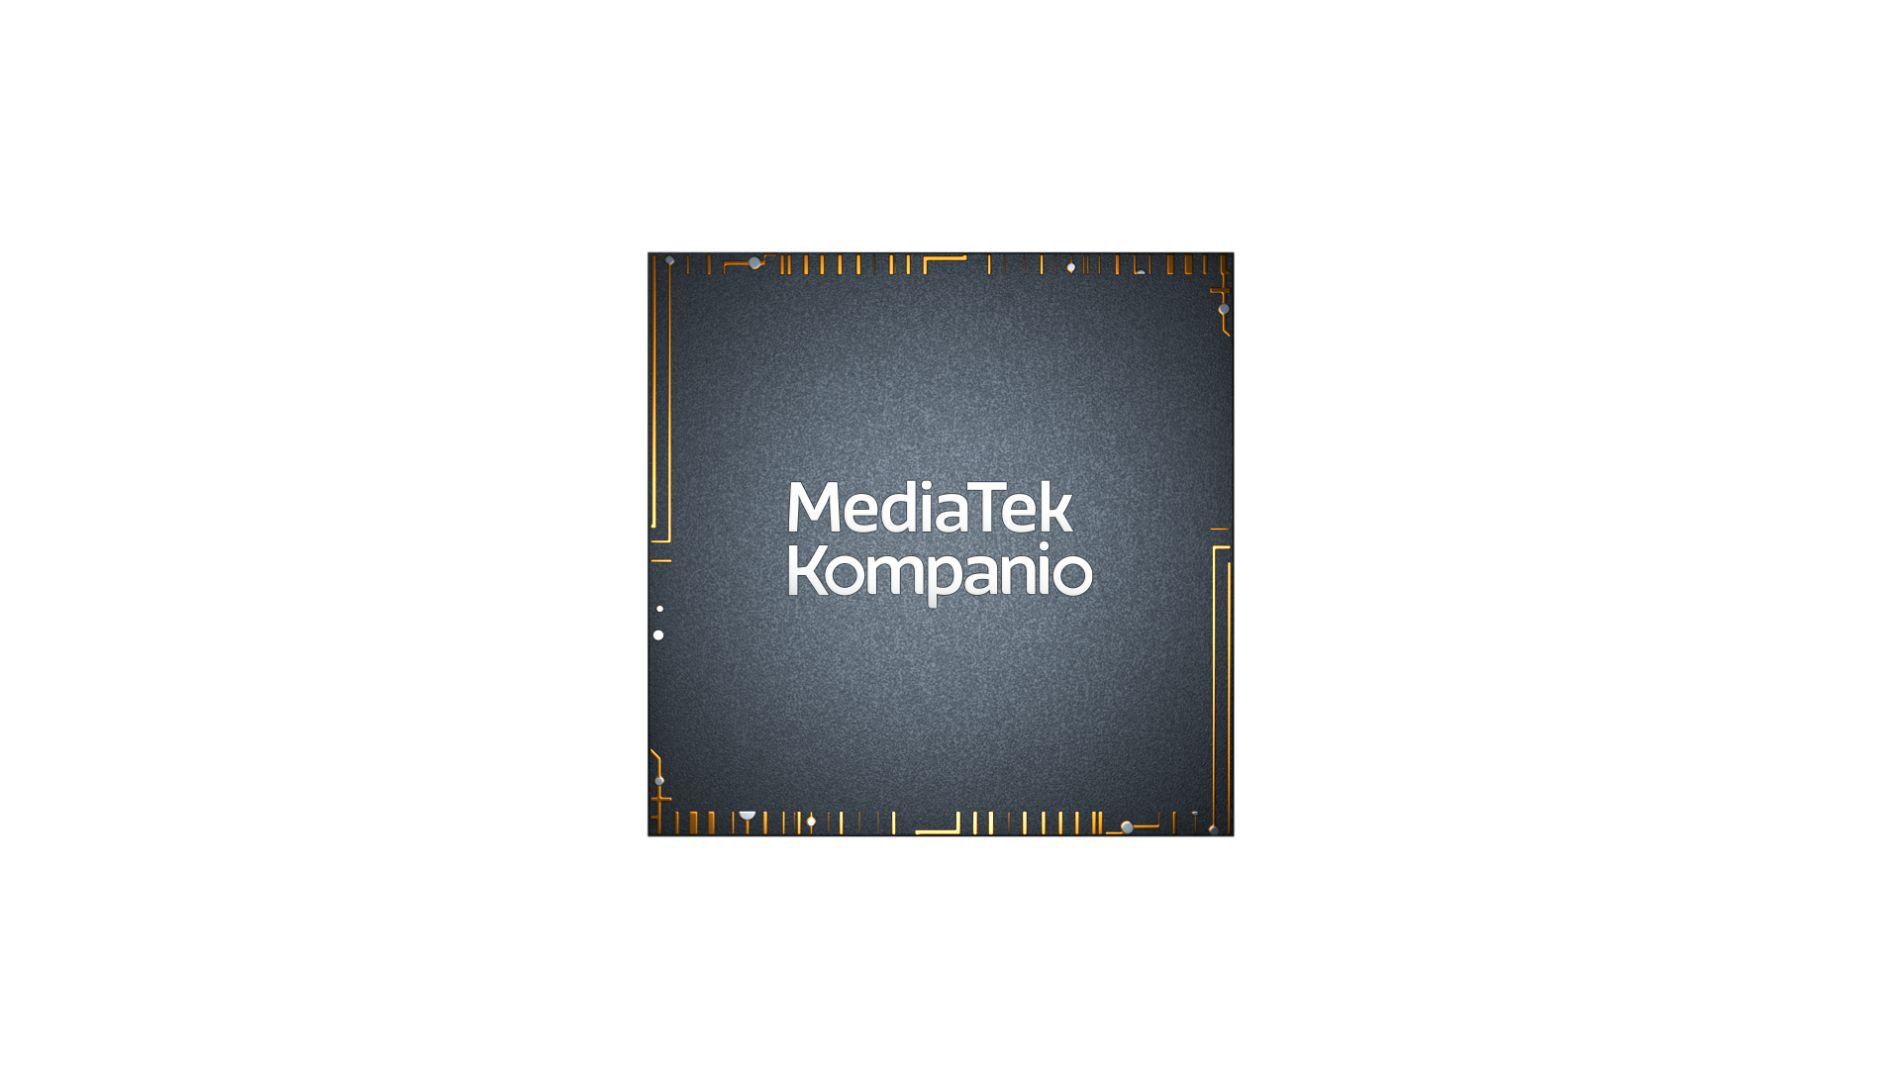 Mediatek Kompanio Chip Image Front